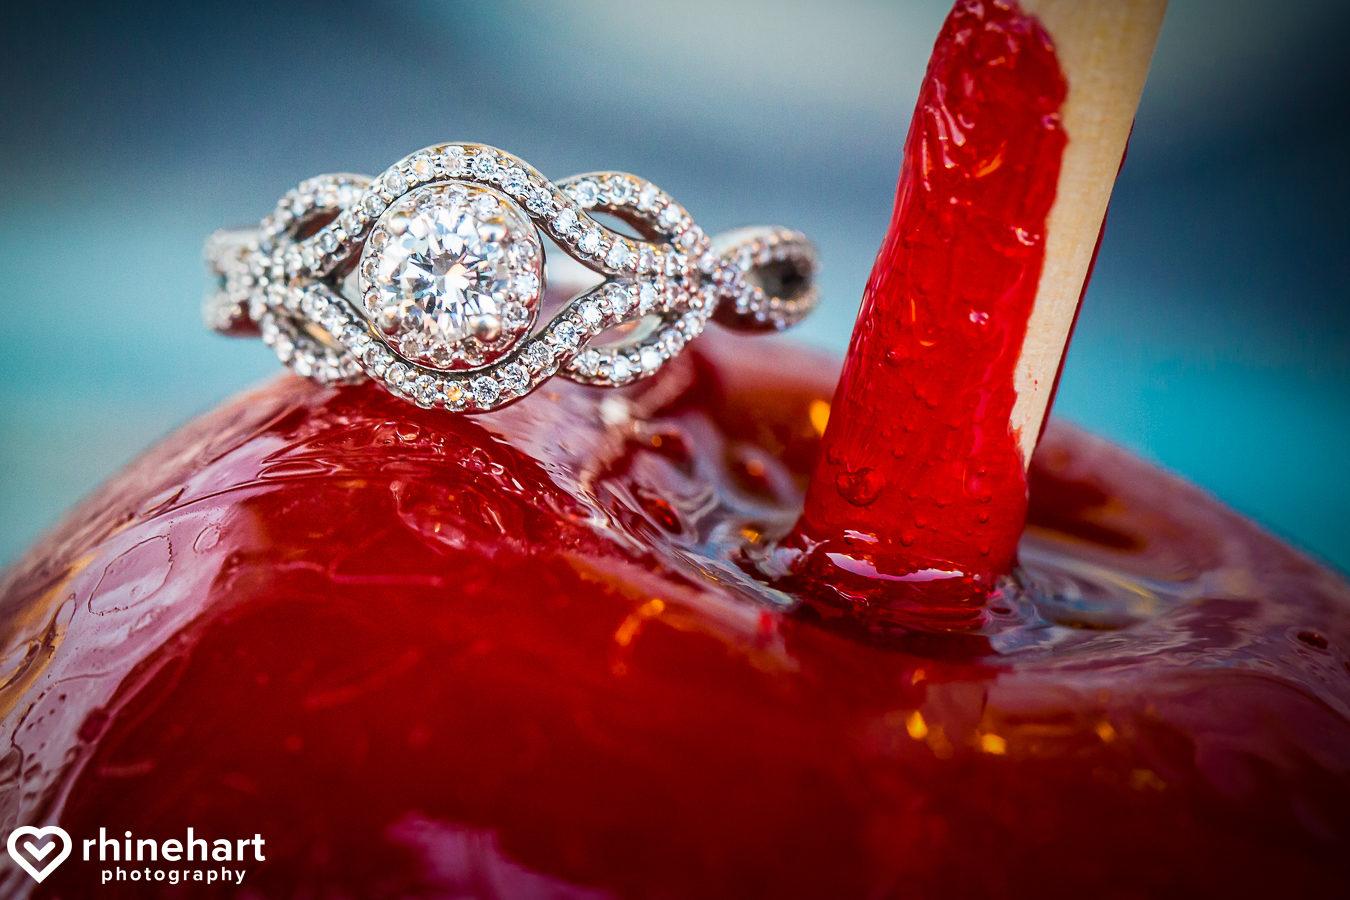 creative-unique-artistic-best-top-colorful-vibrant-emotional-pa-wedding-photographers-23